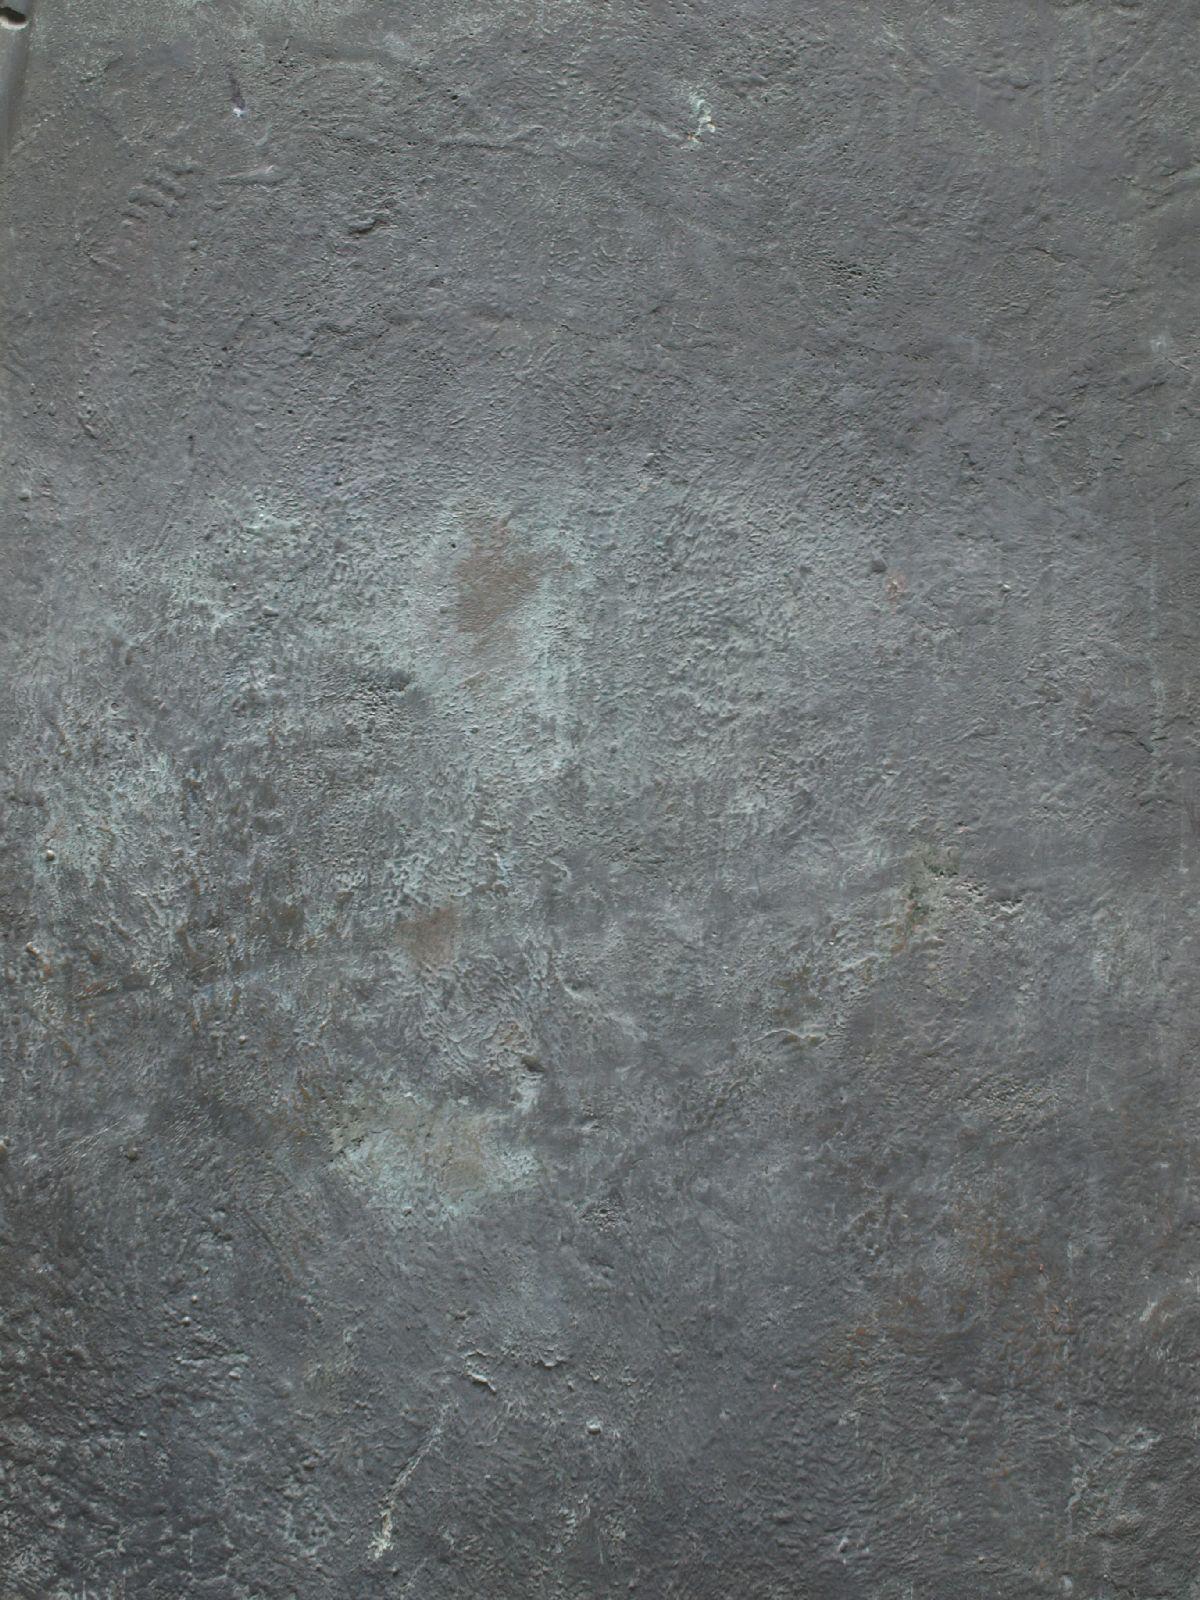 Metall_Textur_A_P4041477